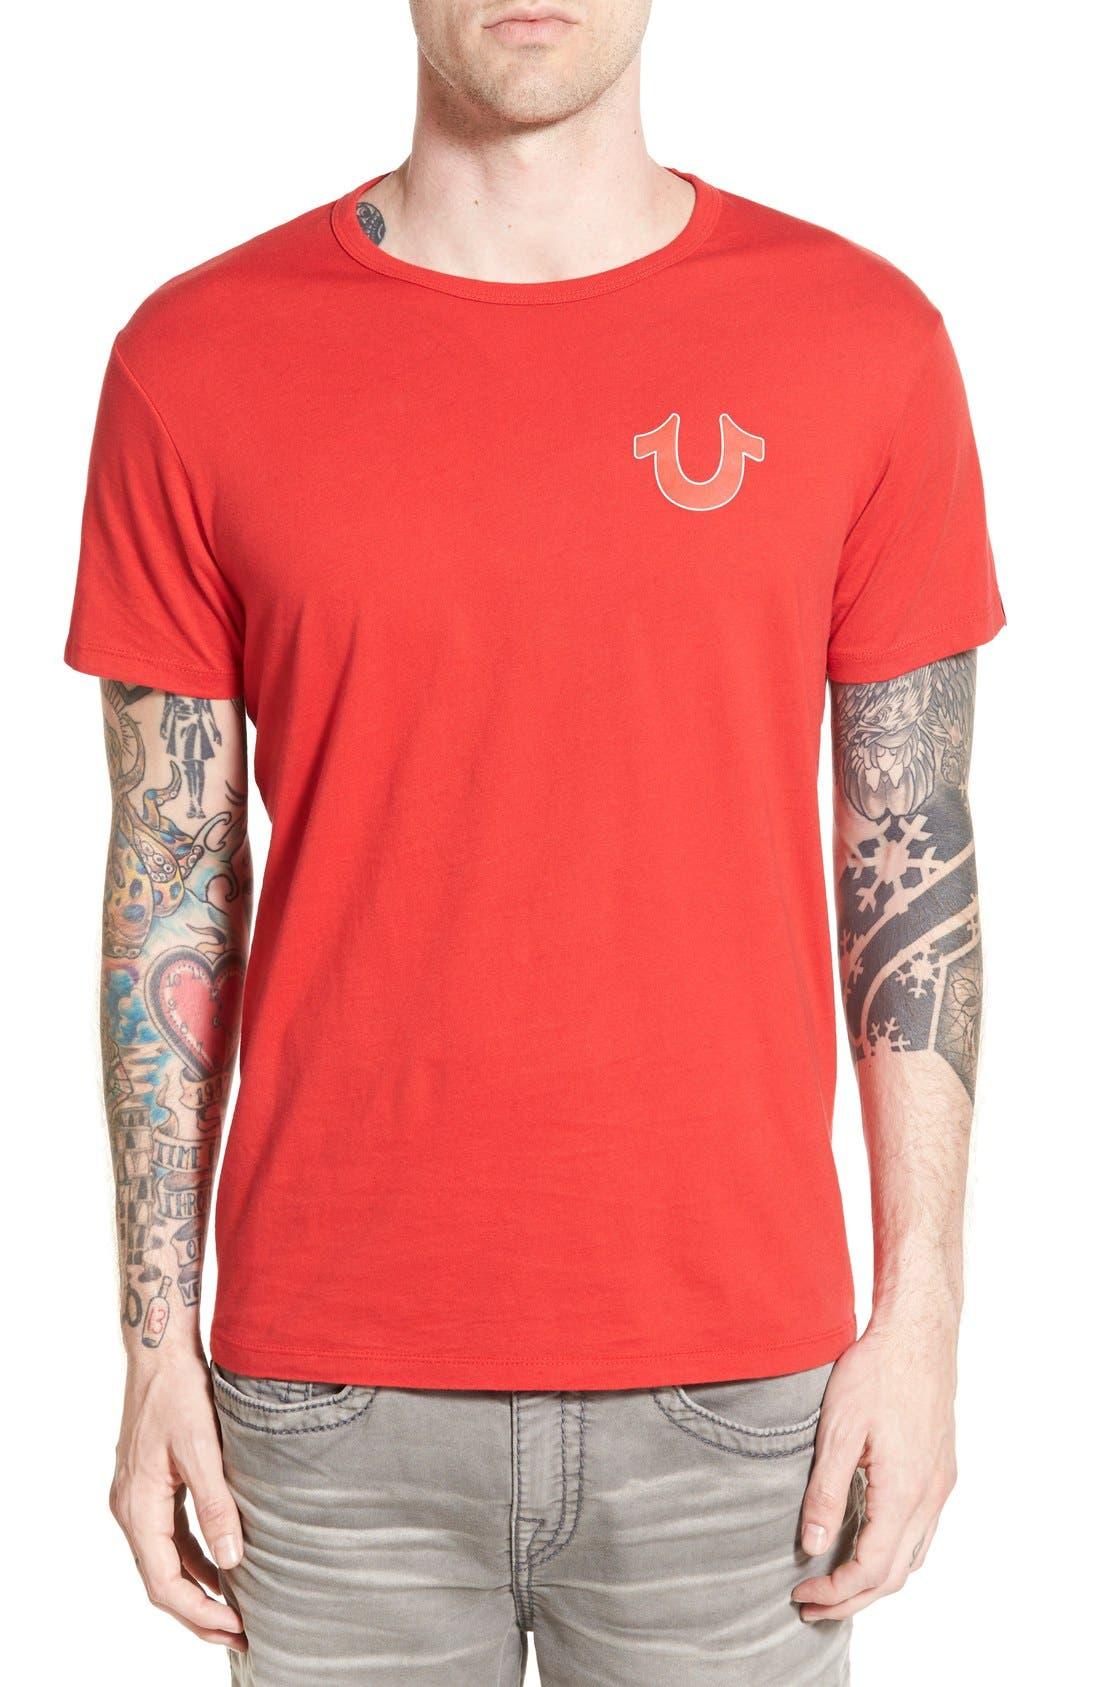 True Religion Brand Jeans 'Double Puff' Graphic Crewneck T-Shirt